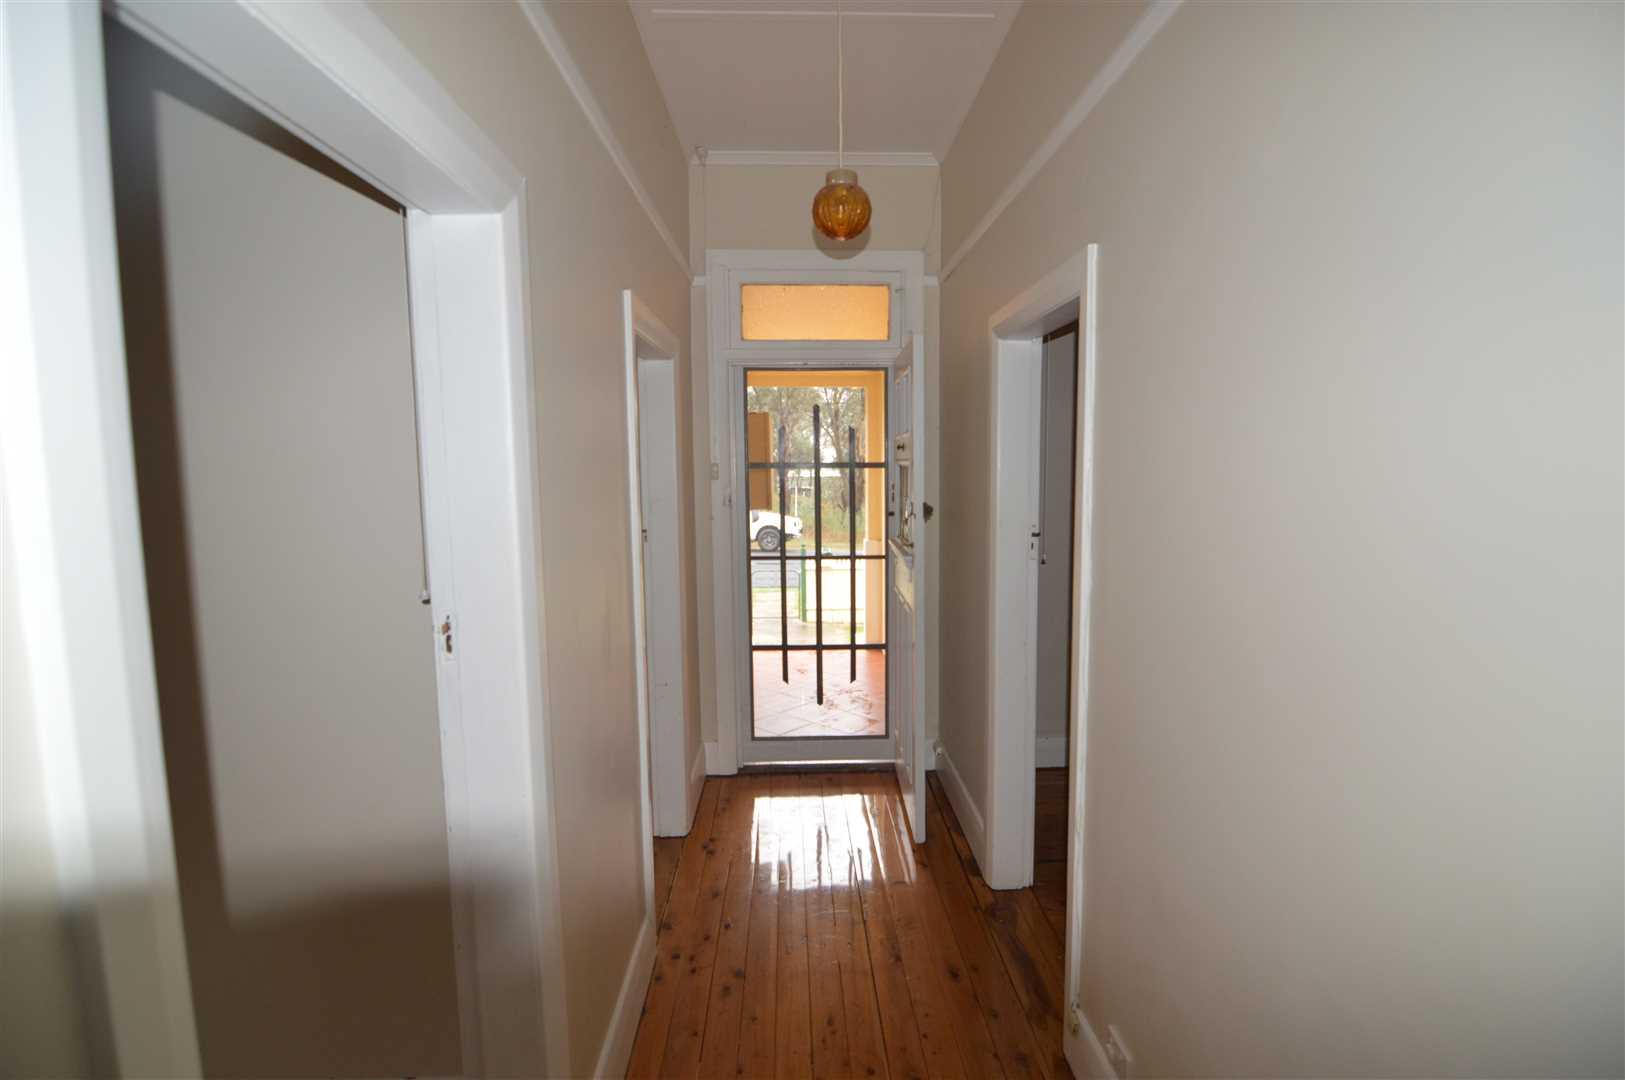 Hallway with polished floor boards